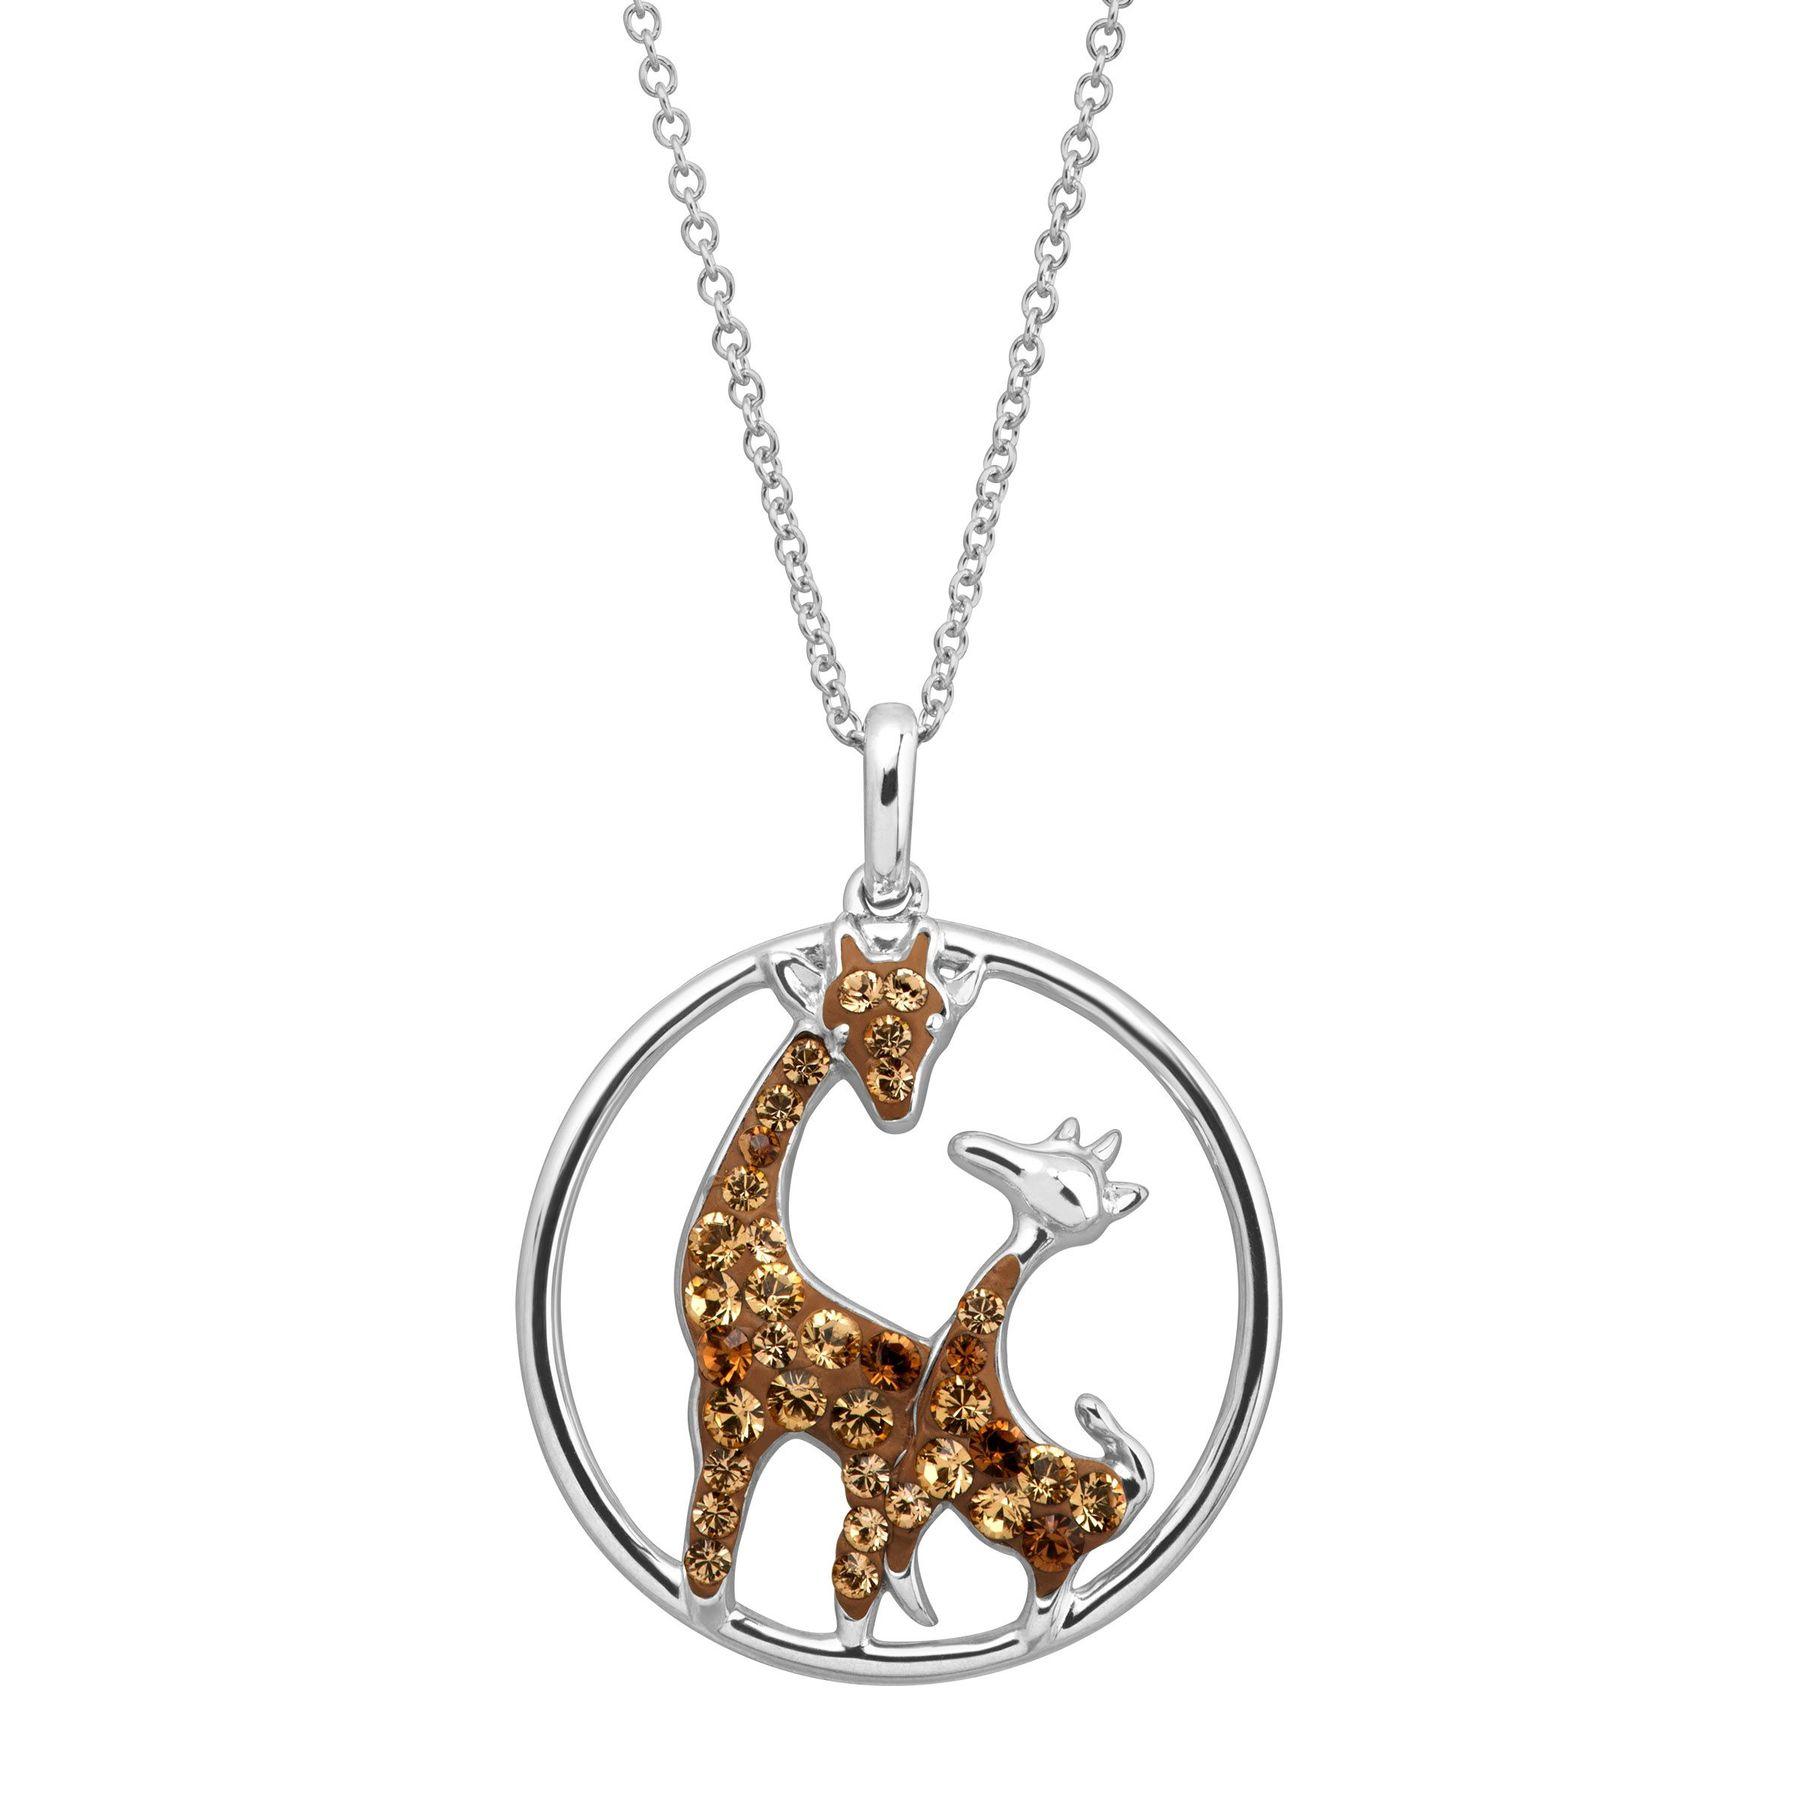 Sterling Silver Open Heart Kissing Giraffes Necklace